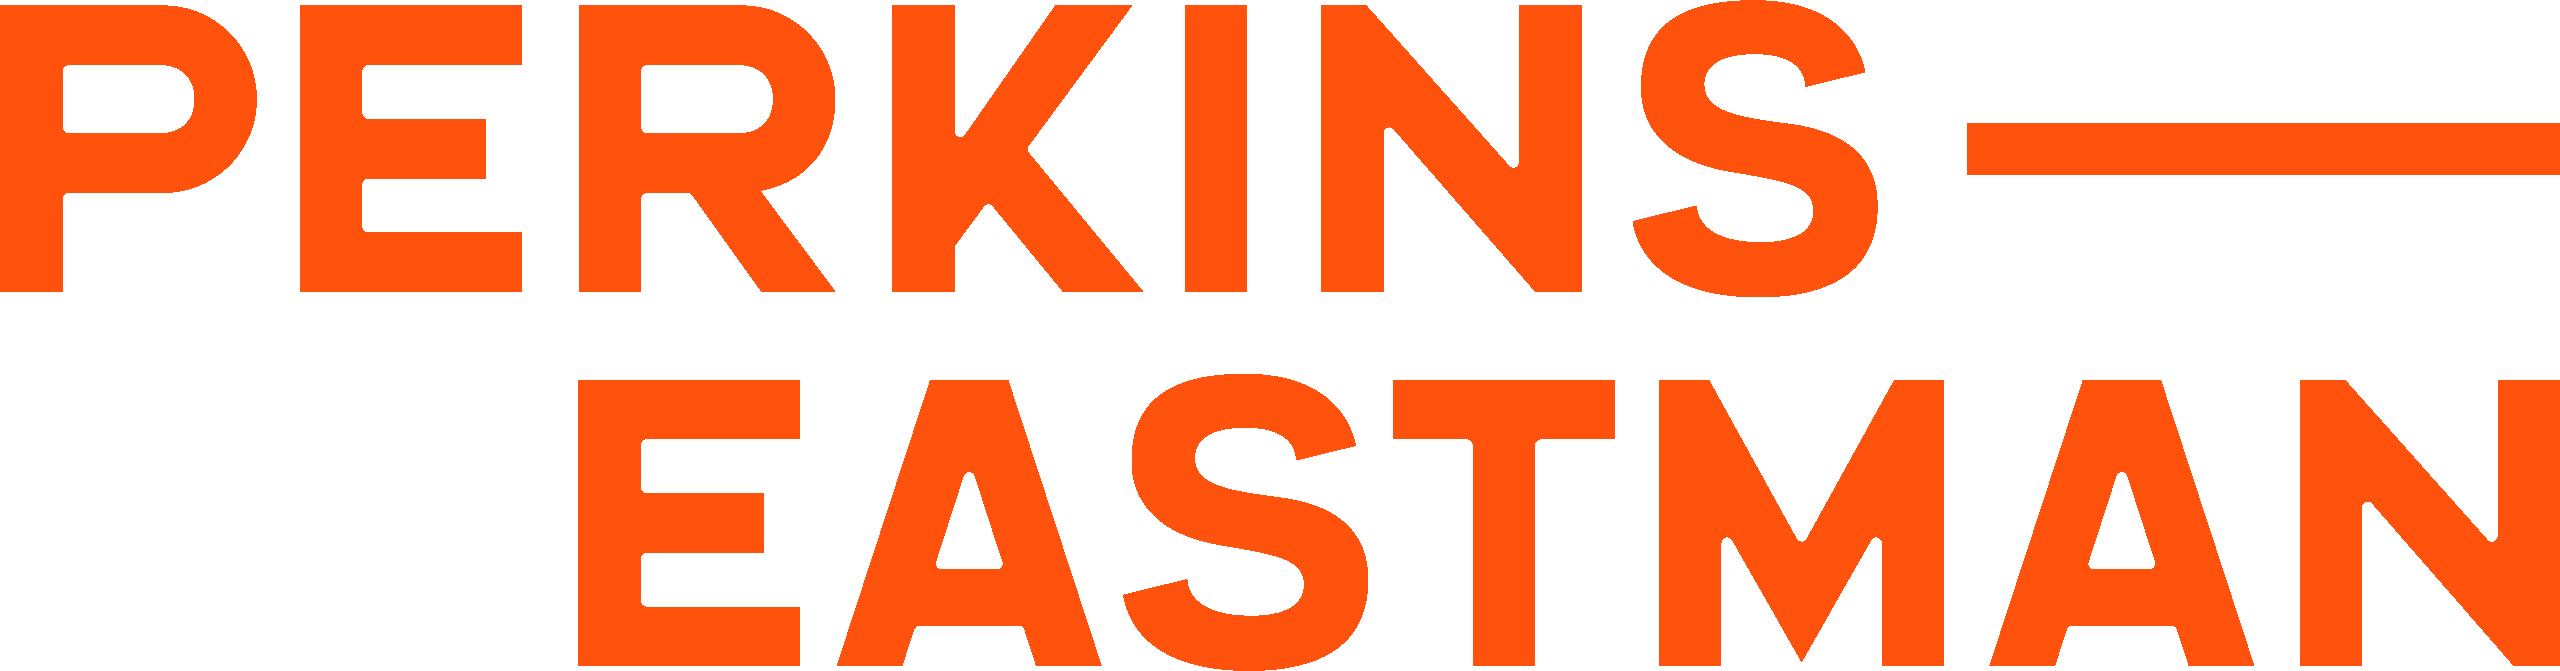 Perkins Eastman Logo